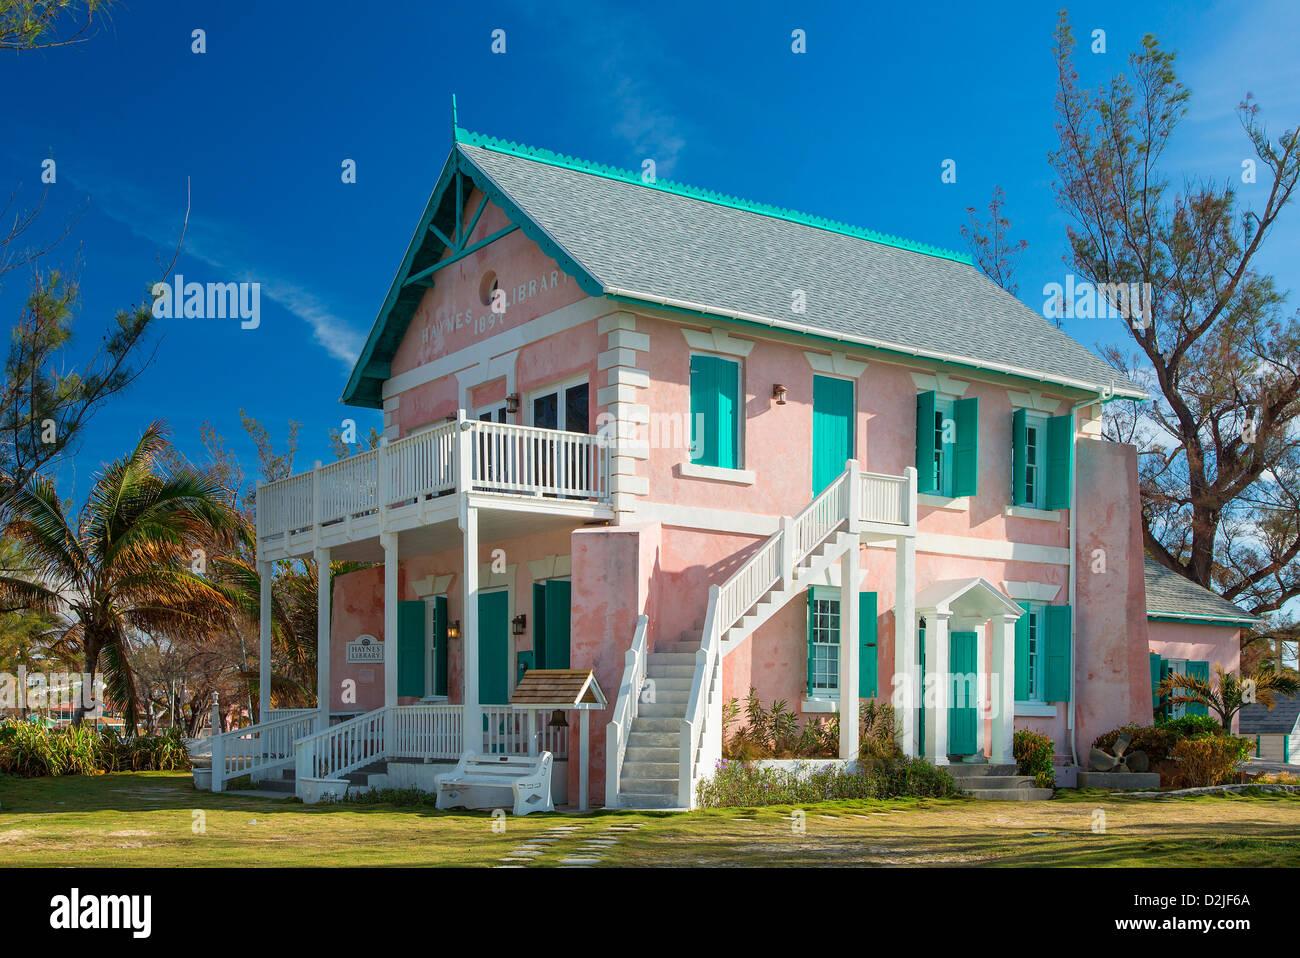 Bahamas, Eleuthera Island, Governor's Harbour - Stock Image